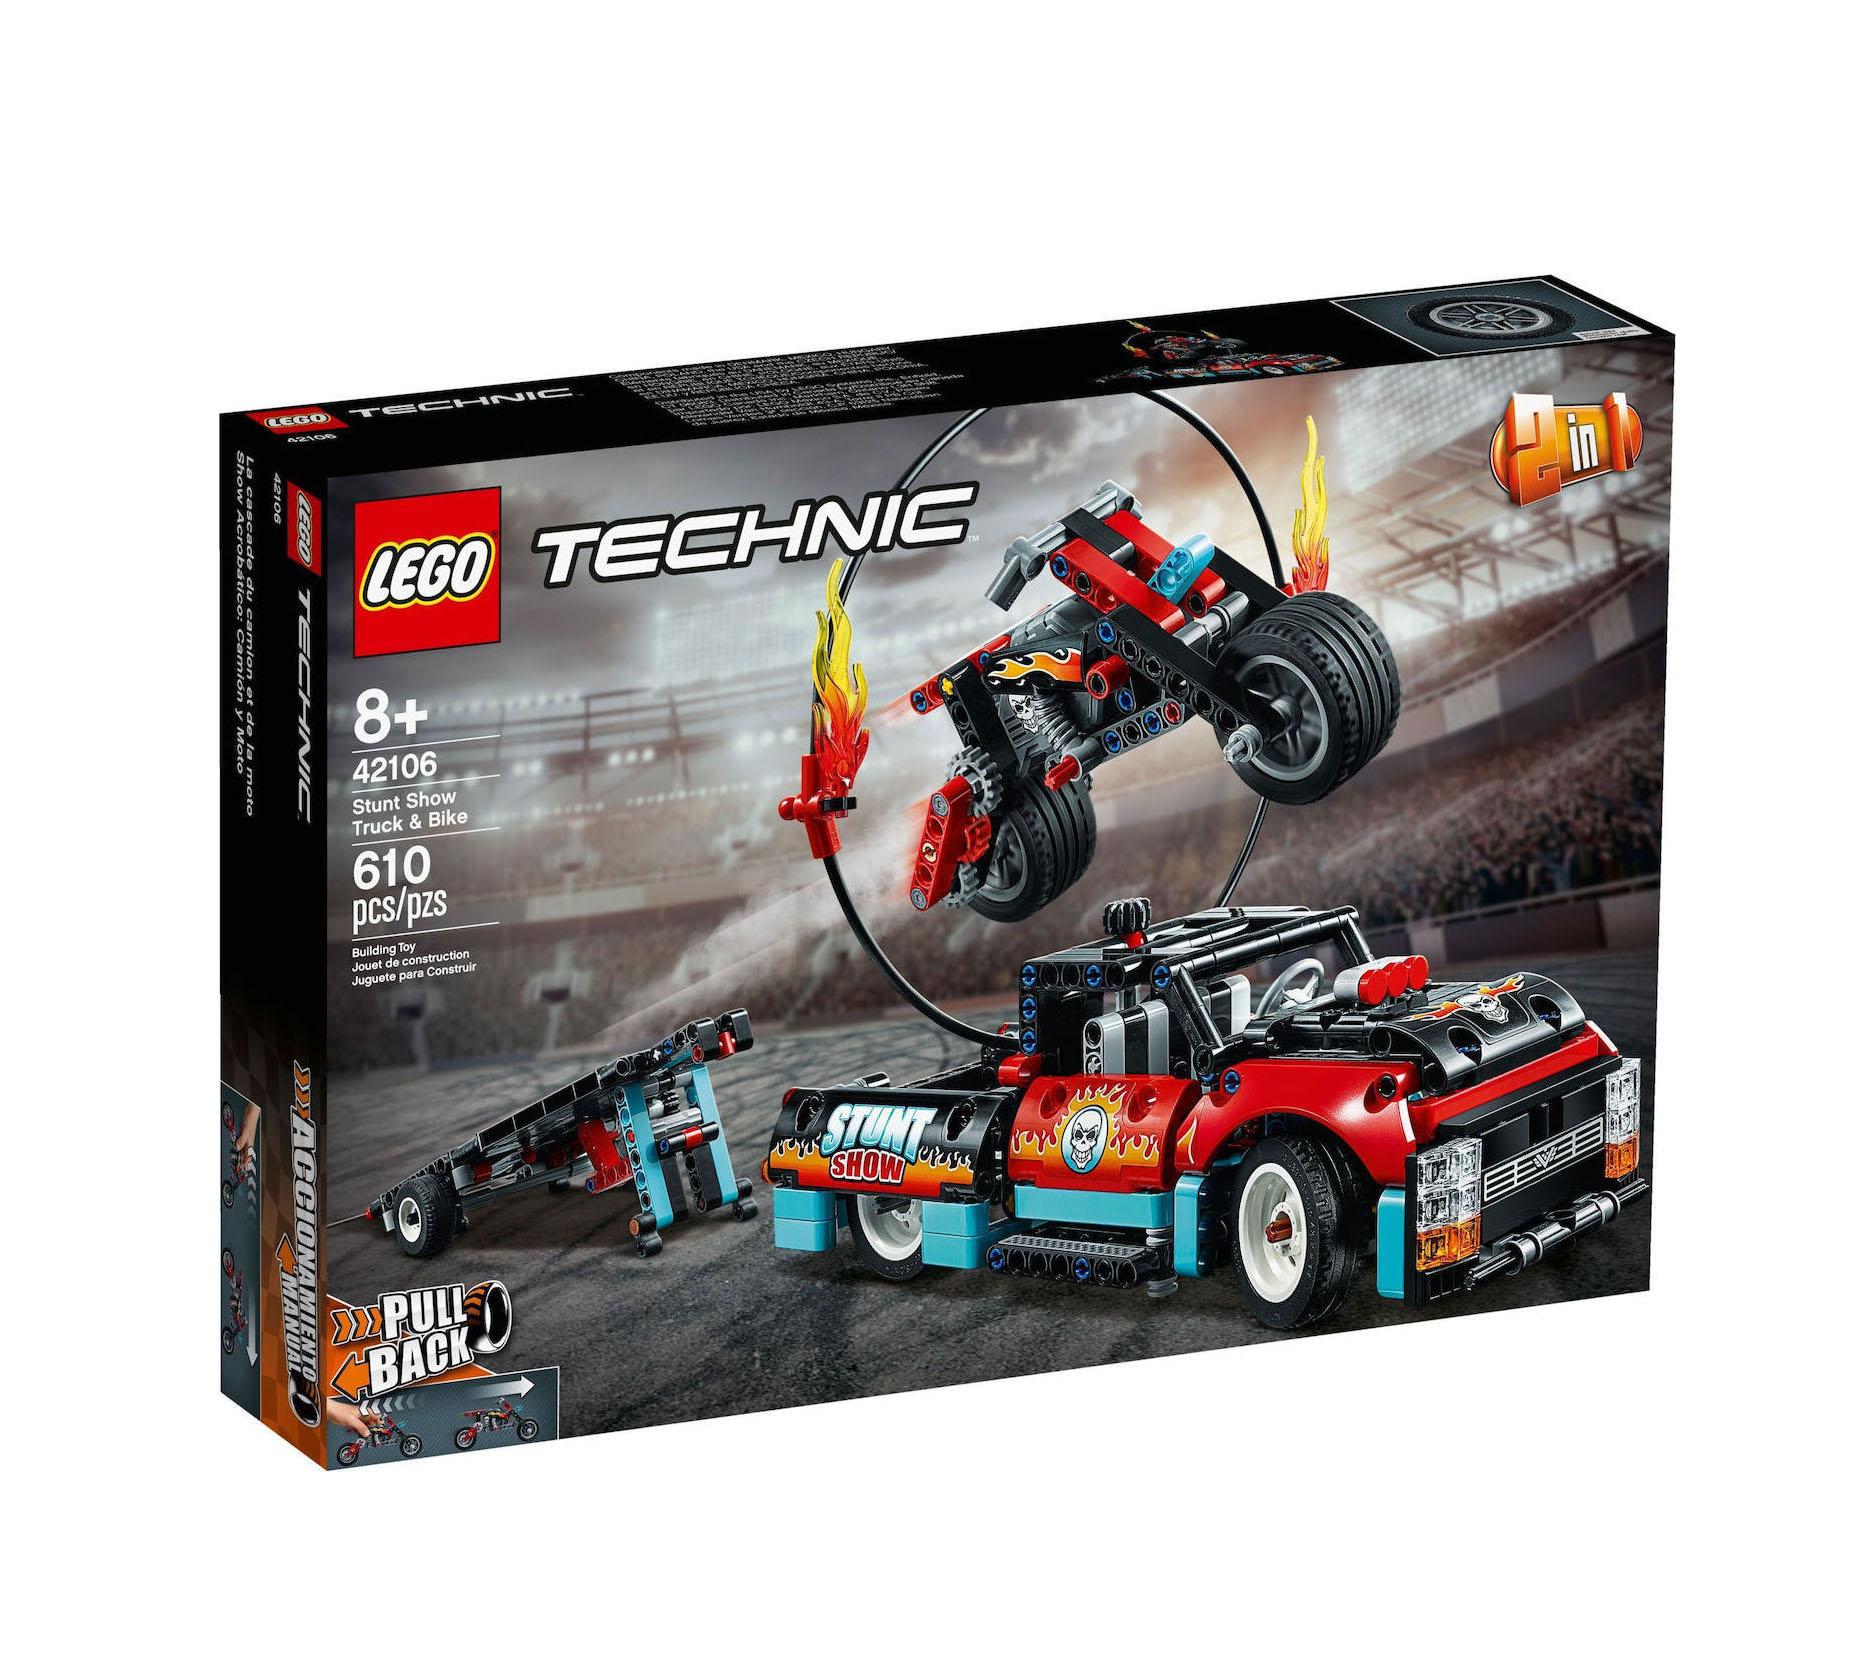 Lego Technic: Stunt Show Truck & Bike 42106